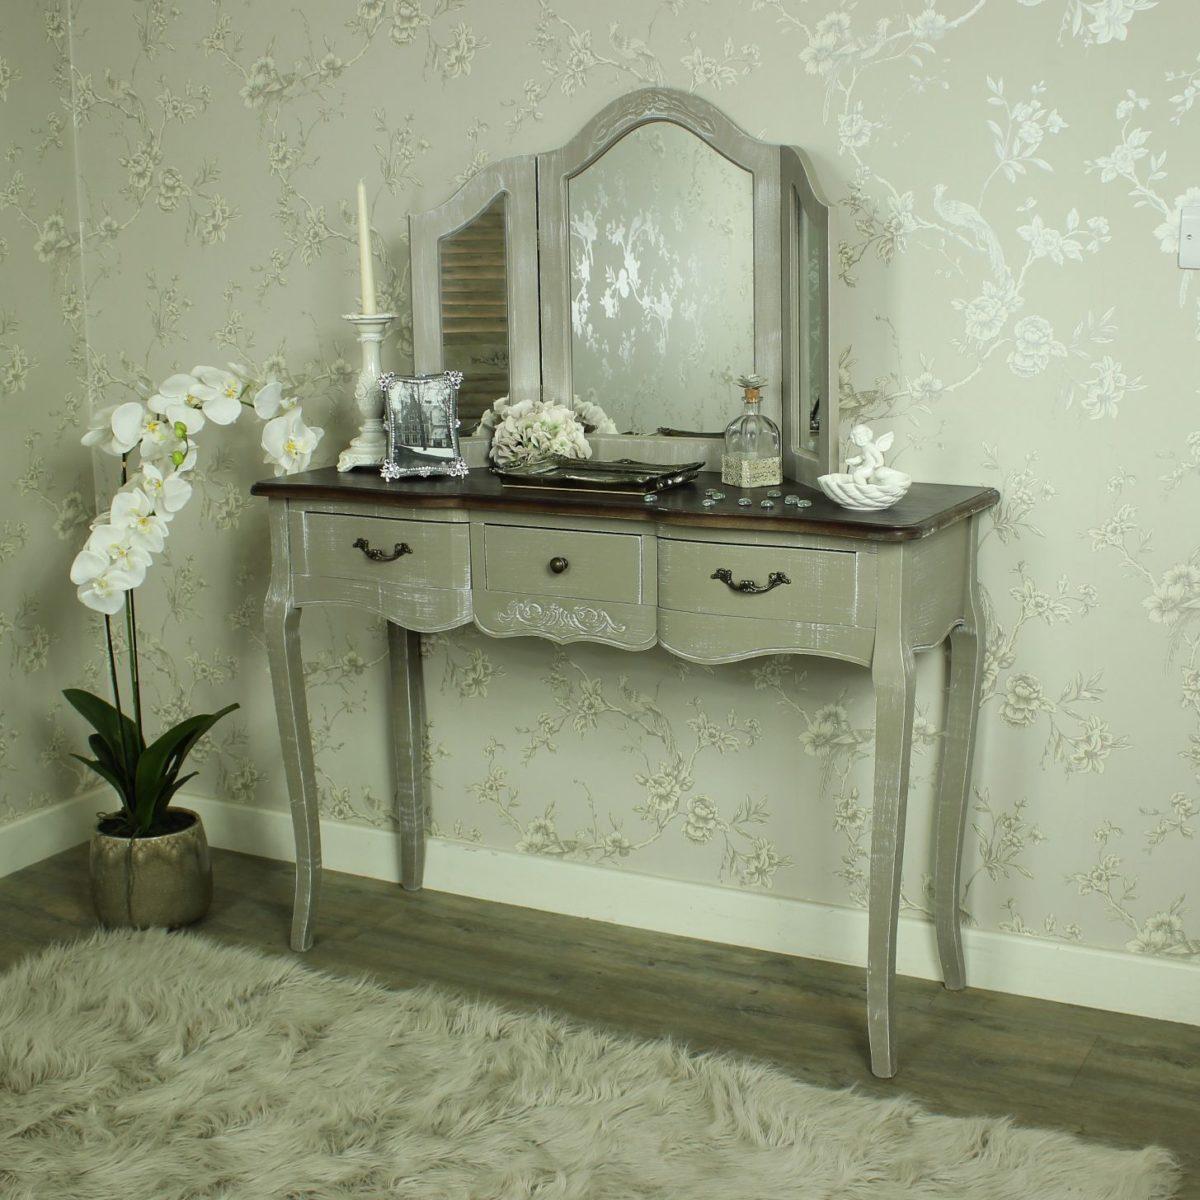 4flora-furniture_large-grey-dressing-table-and-triple-mirror-set-french-grey-range-1200x1200.jpg